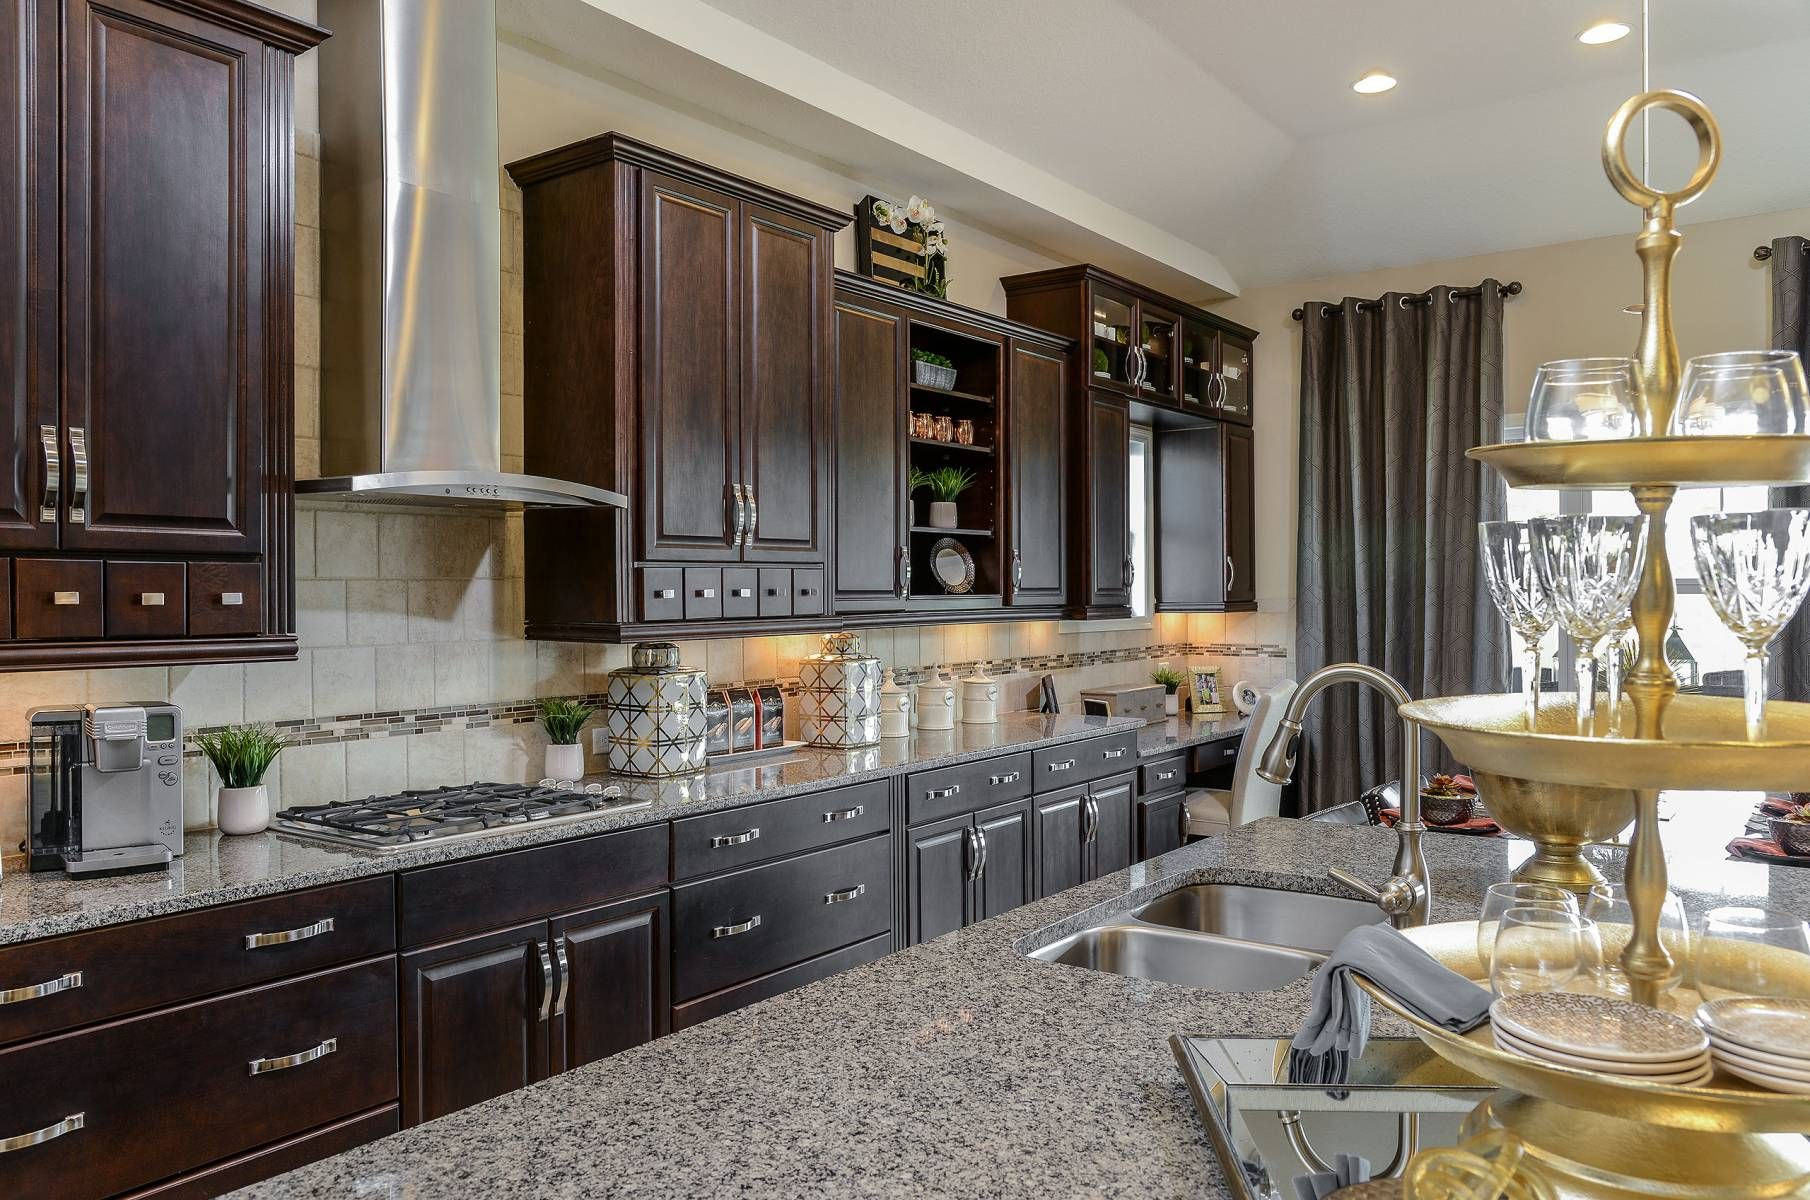 This Biscayne Ii Model Home Features Dark Cabinets With A Large Island Gourmet Kitchen Connerton Neighborhood Ta Kitchen Interior Dark Kitchen Cabinets Home